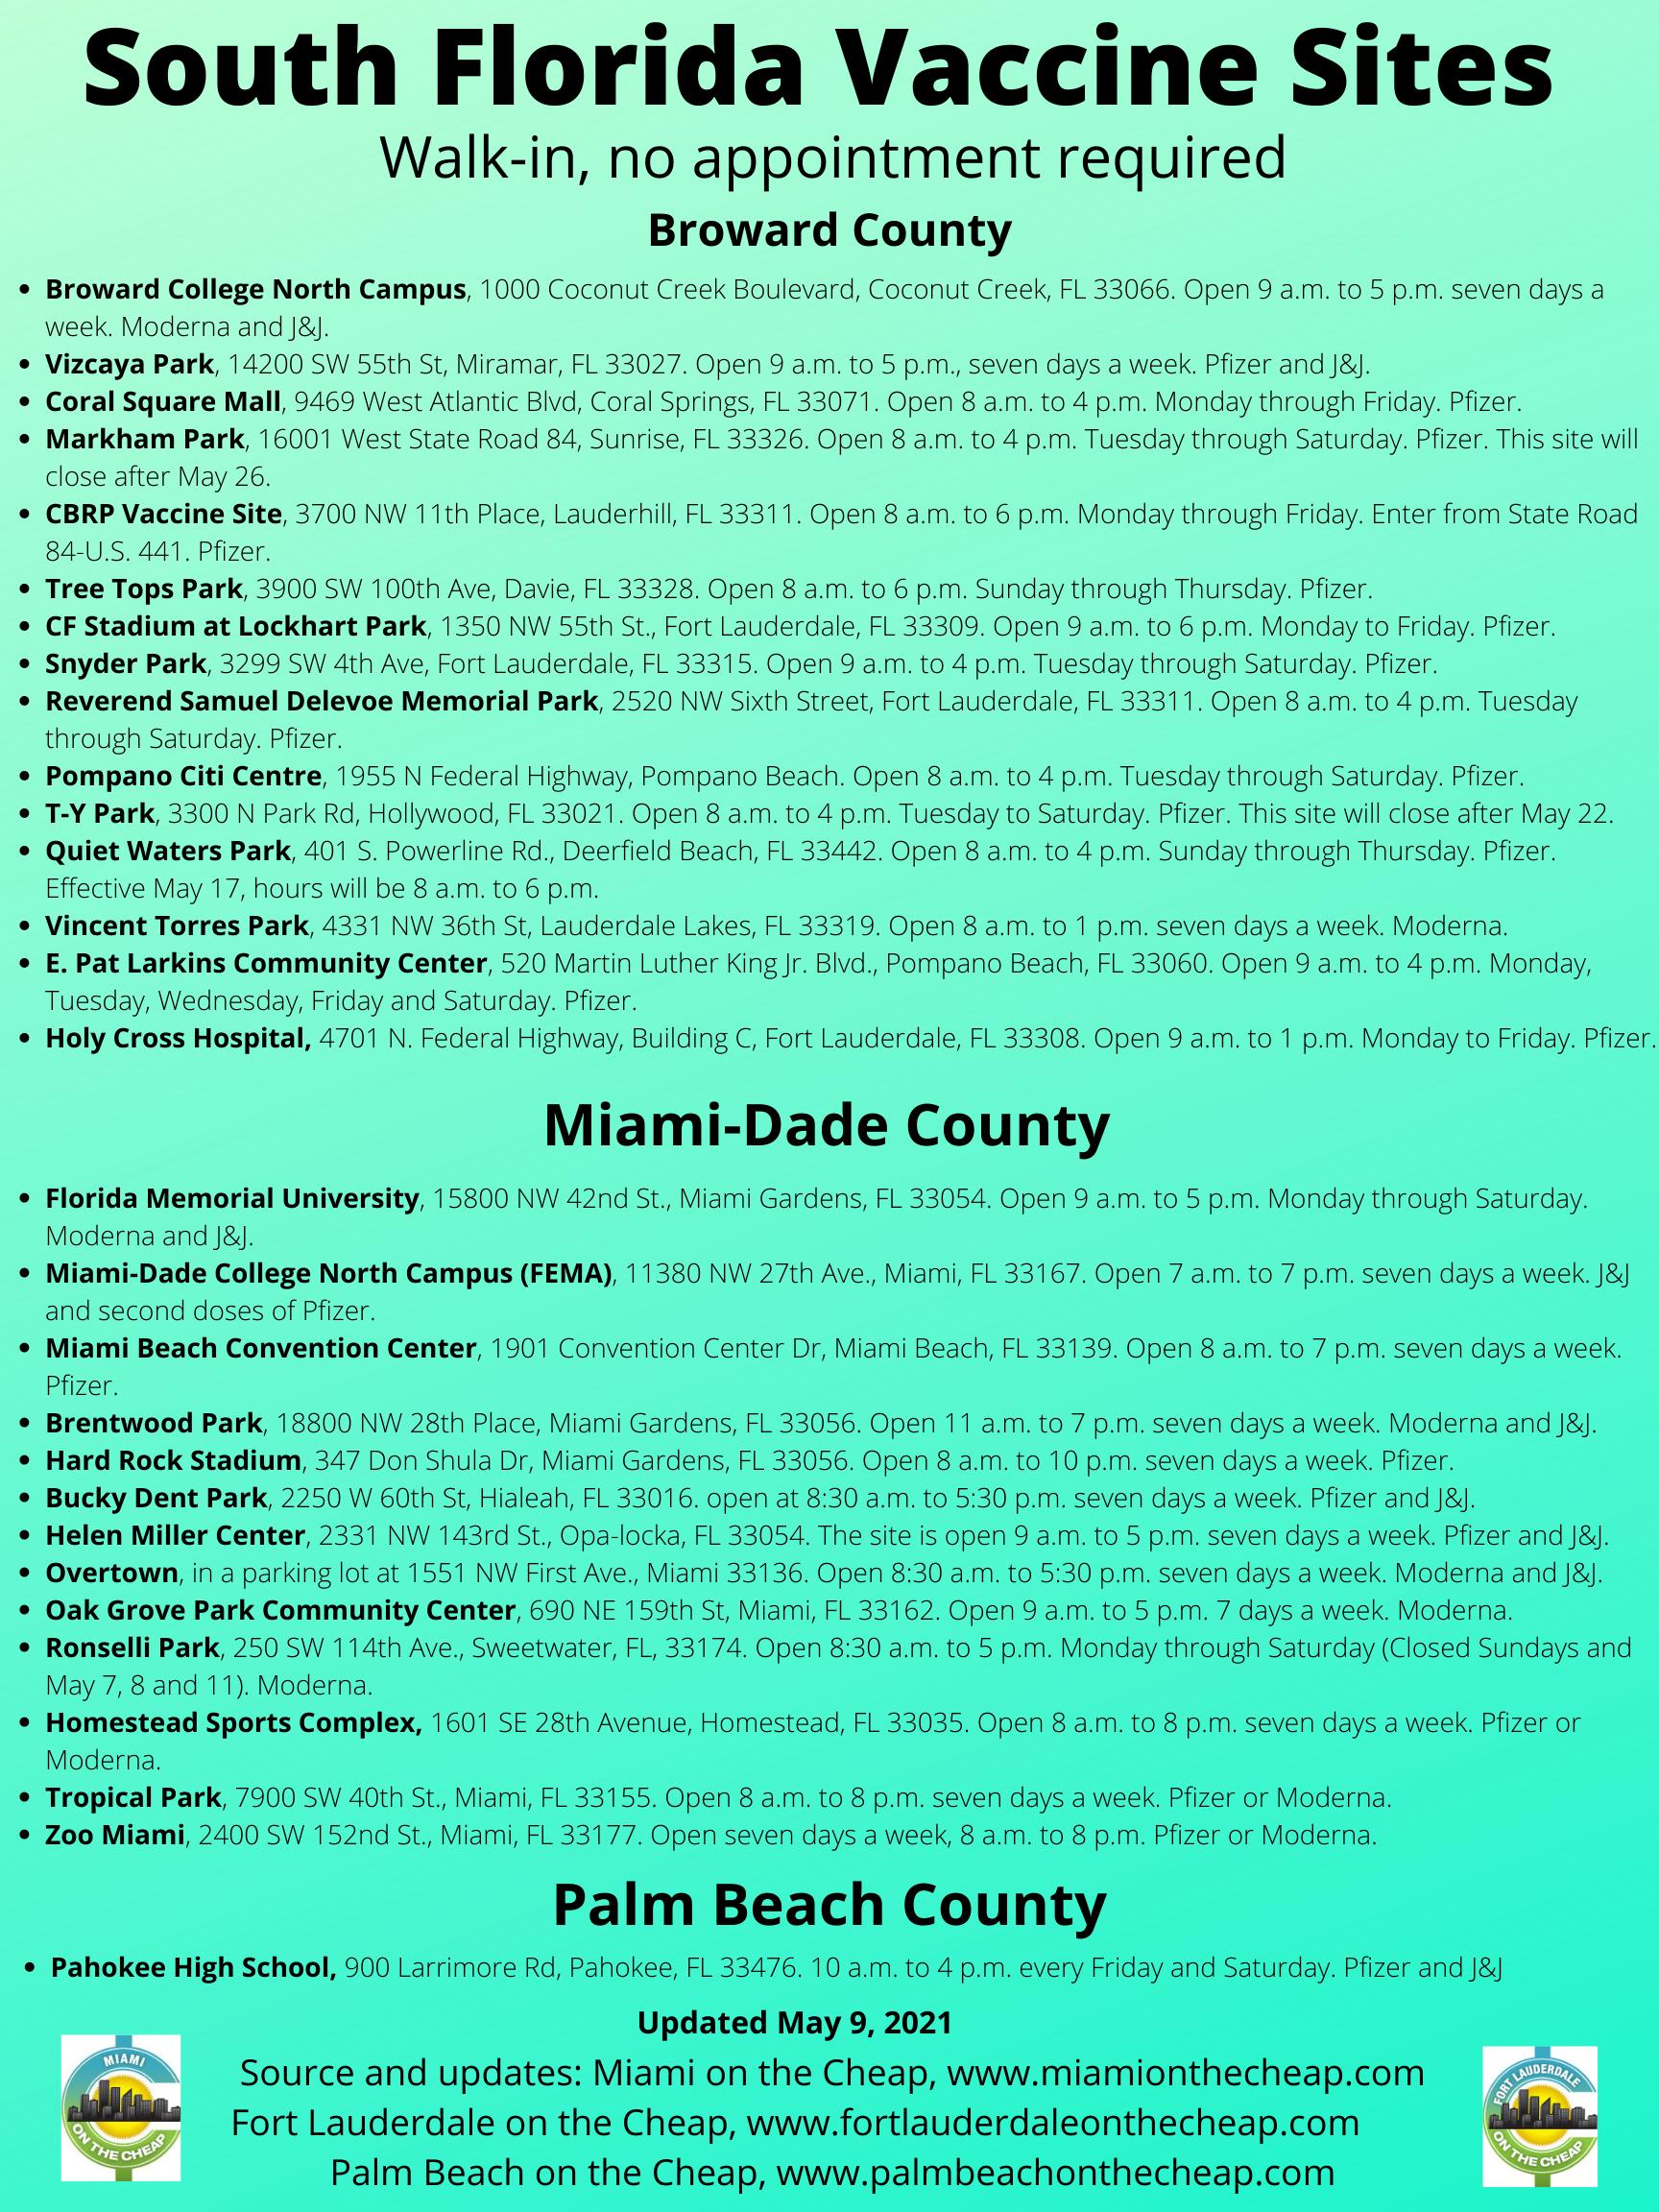 South Florida vaccine pop-up sites